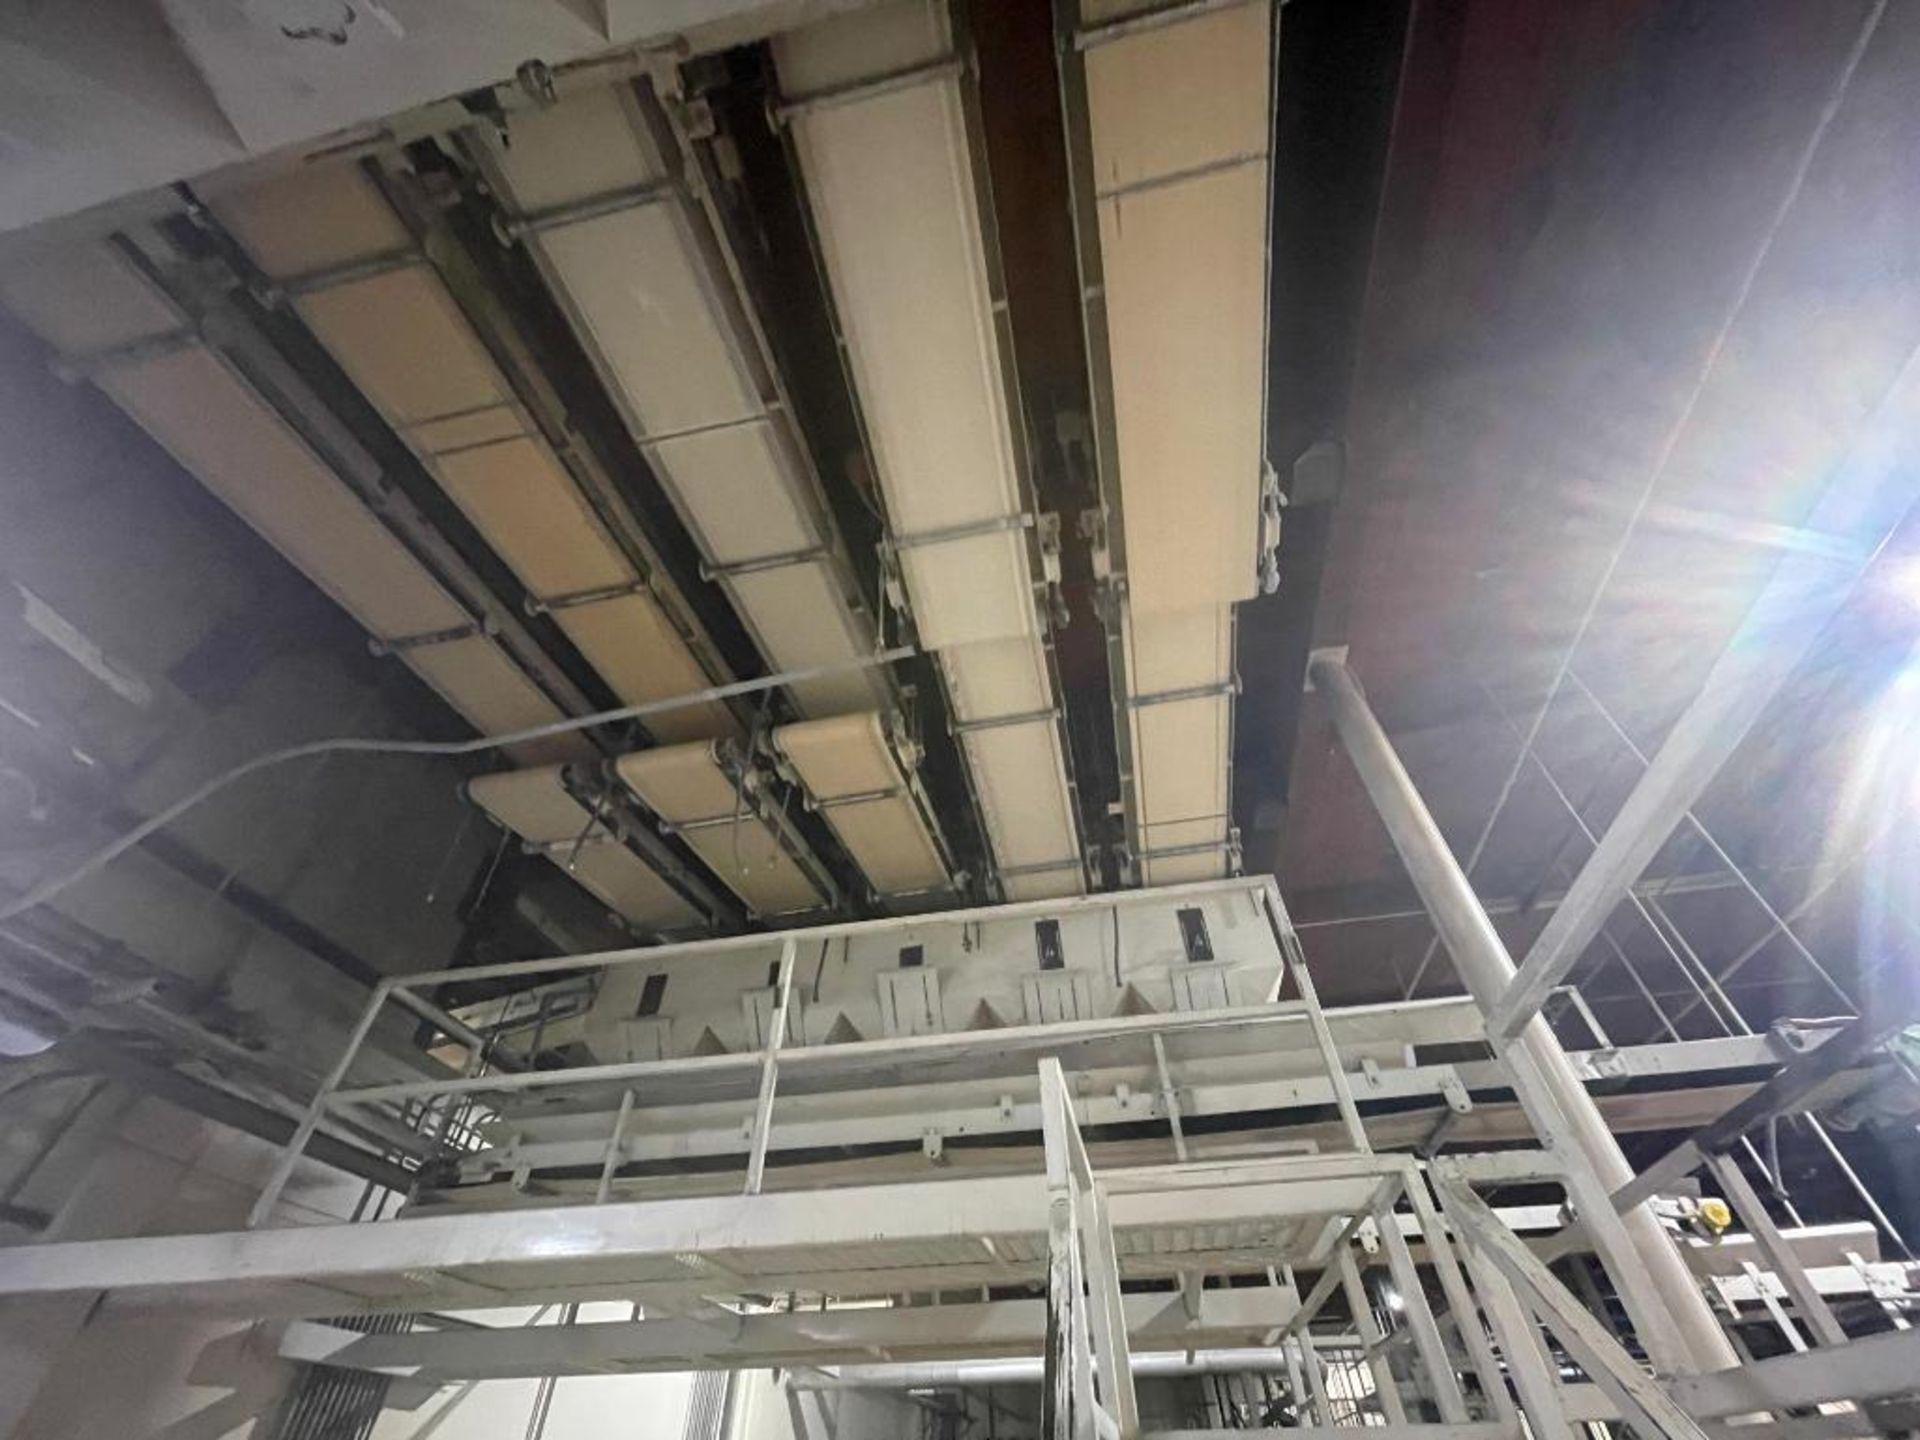 5 overhead conveyors, white rubber belt